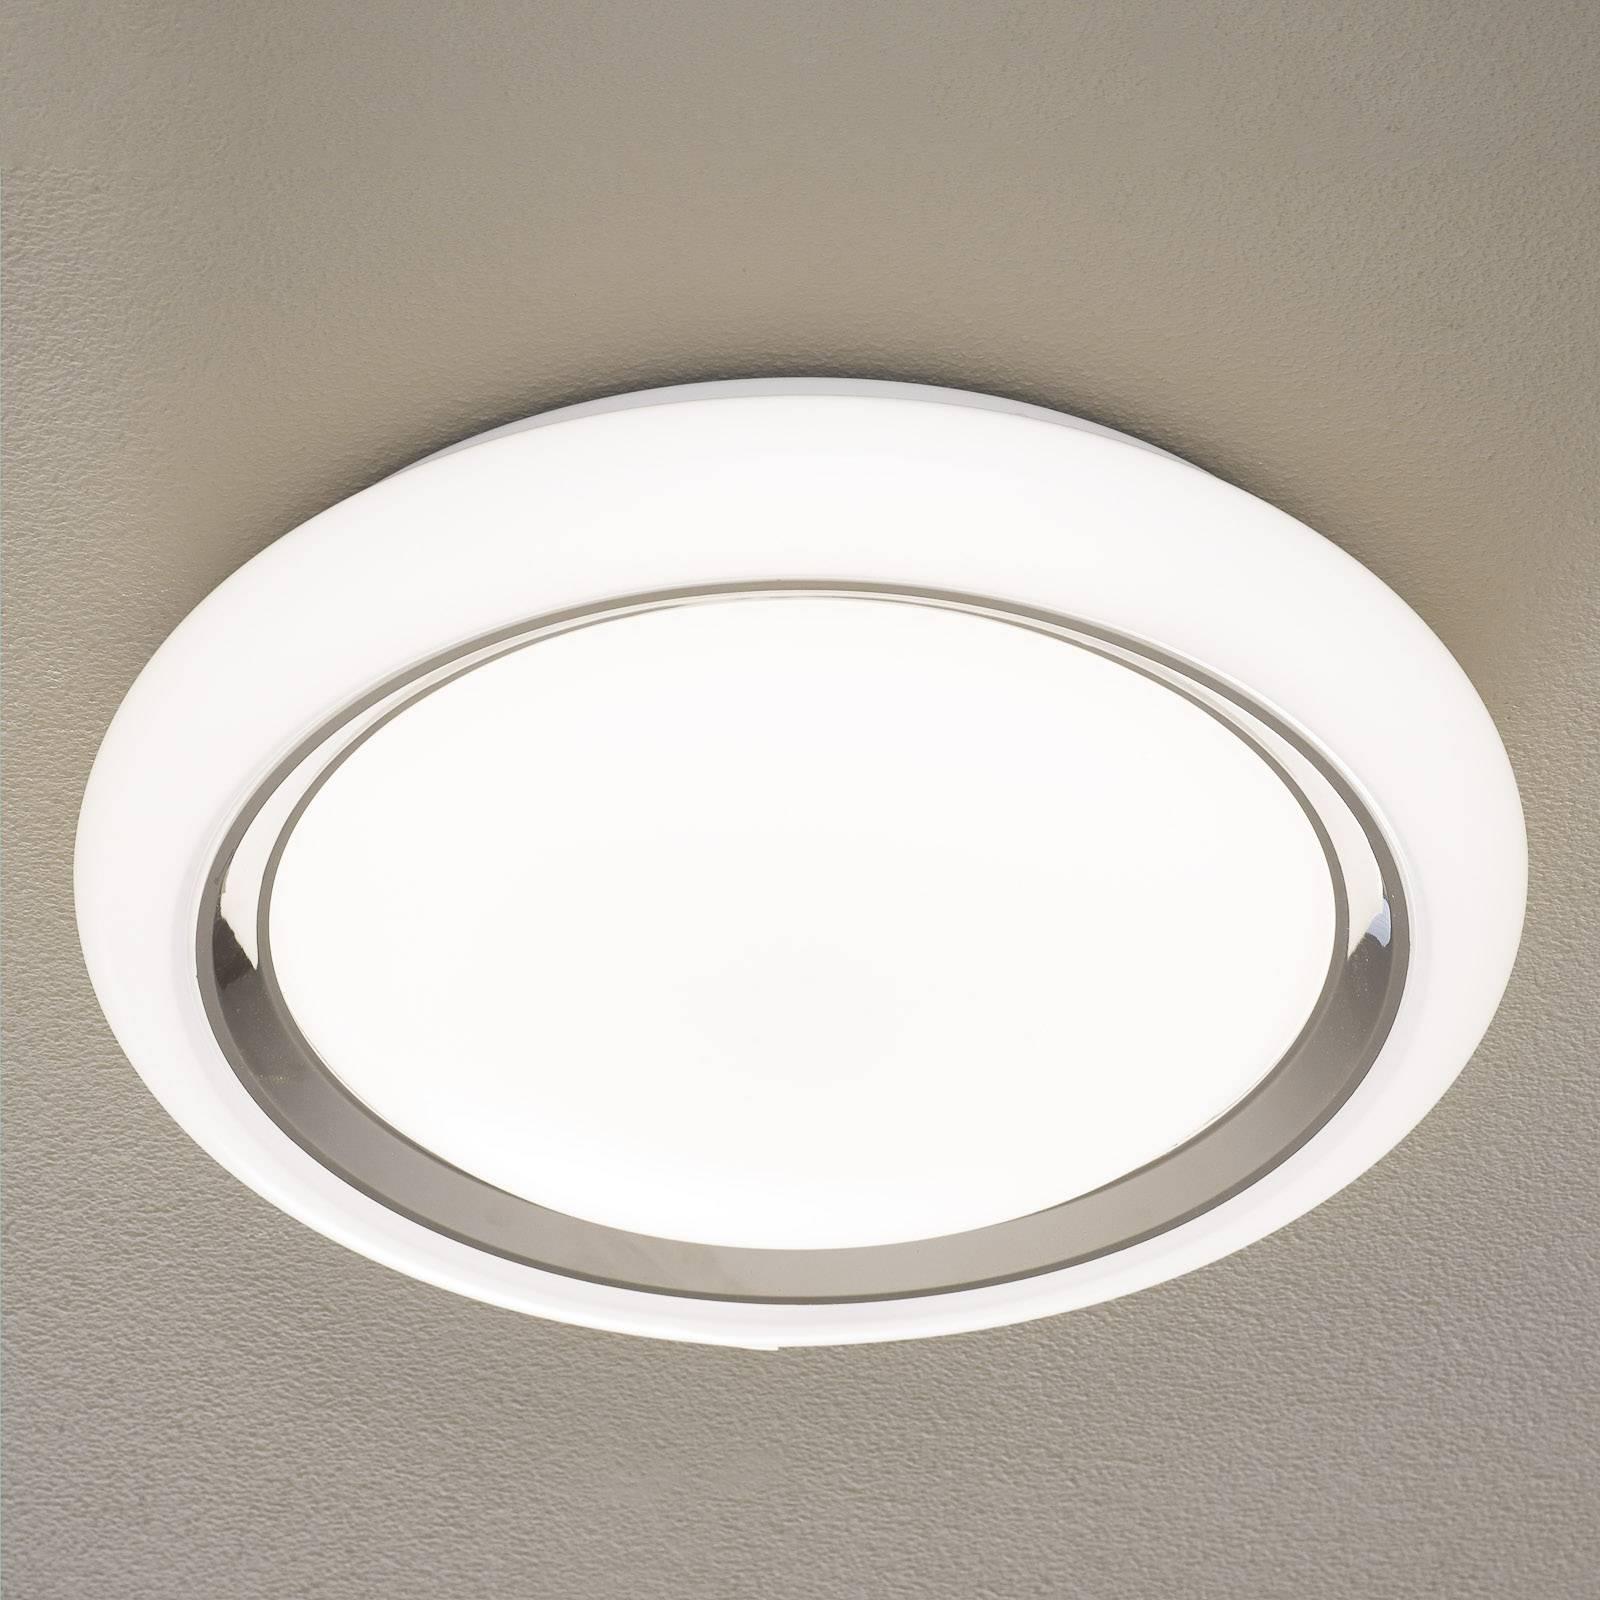 EGLO connect Capasso-C LED plafondlamp wit-chroom